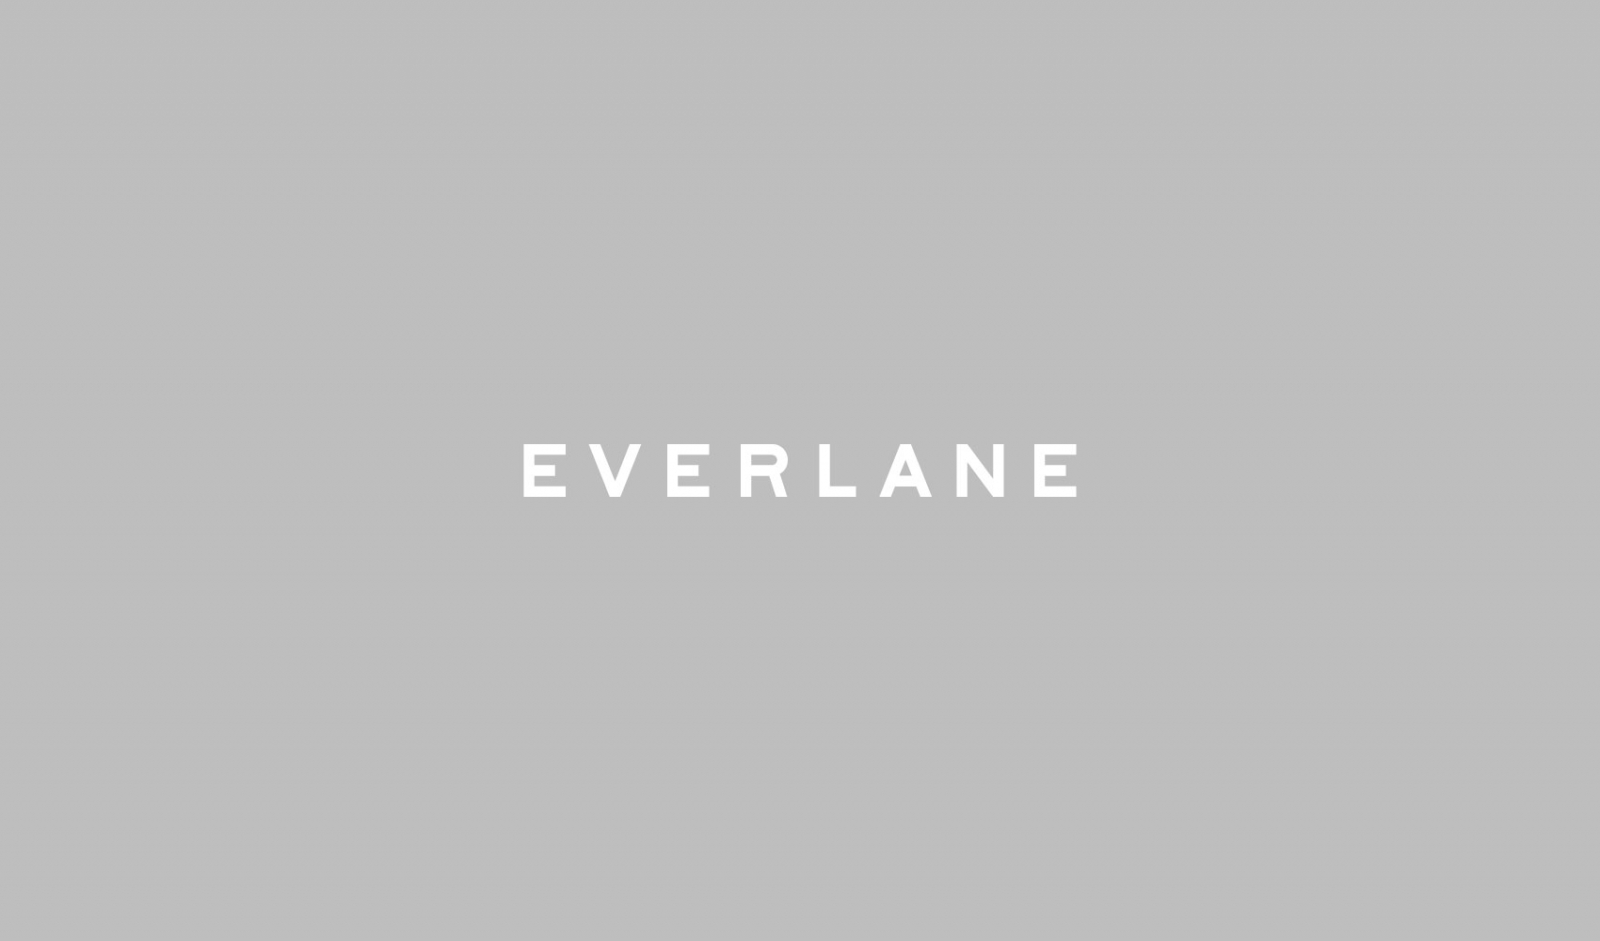 Everlane — TRIBORO.